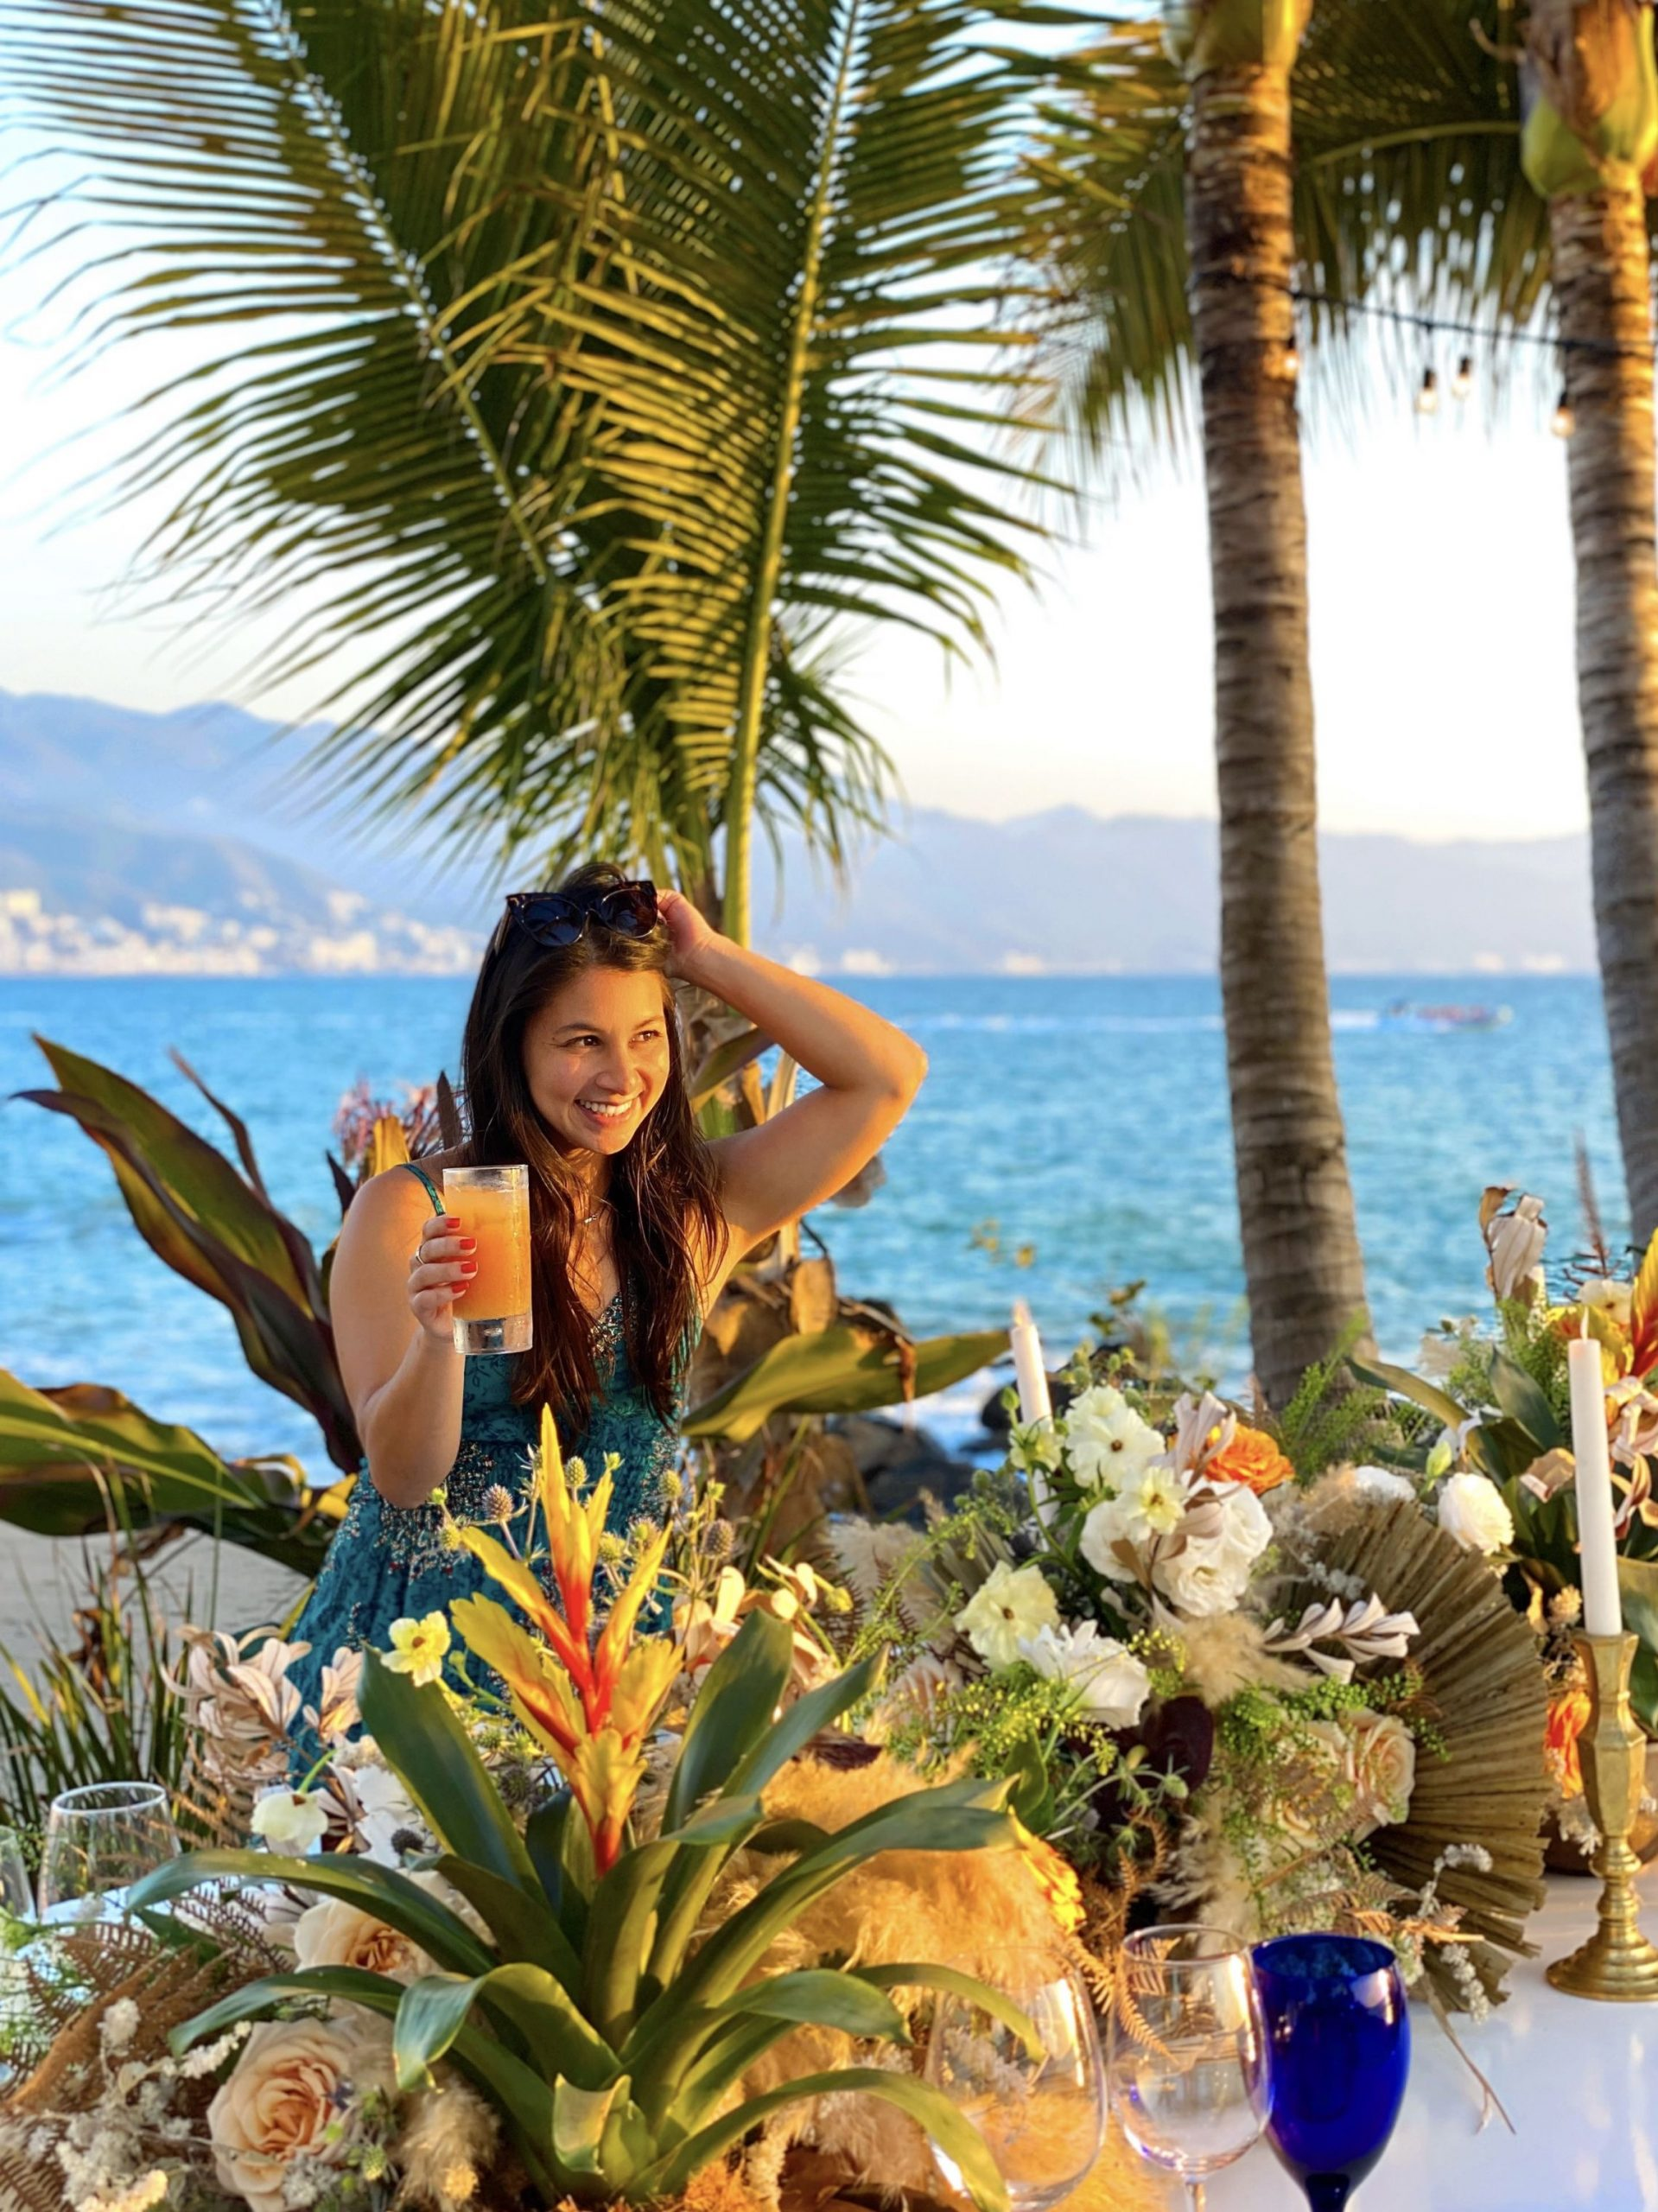 Floral beach dinner in Puerto Vallarta, Mexico.